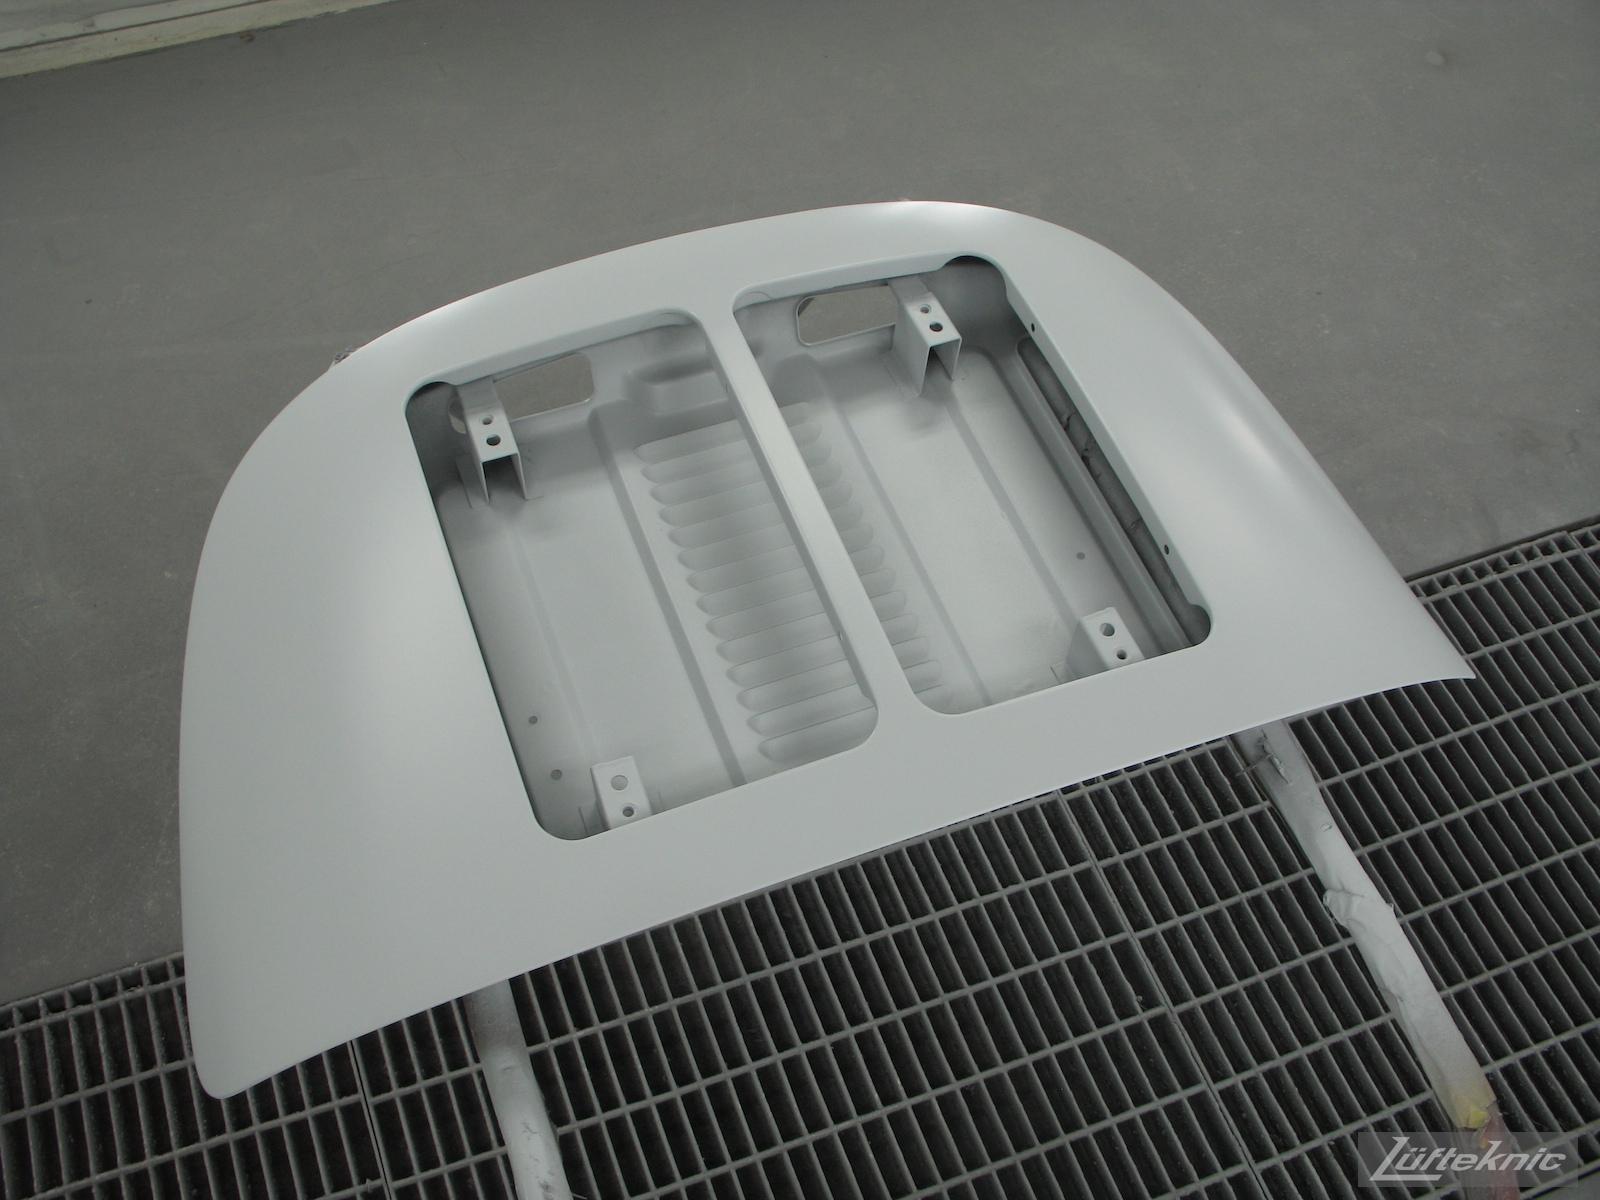 Primered engine cover for White 1964 Porsche 356SC restoration